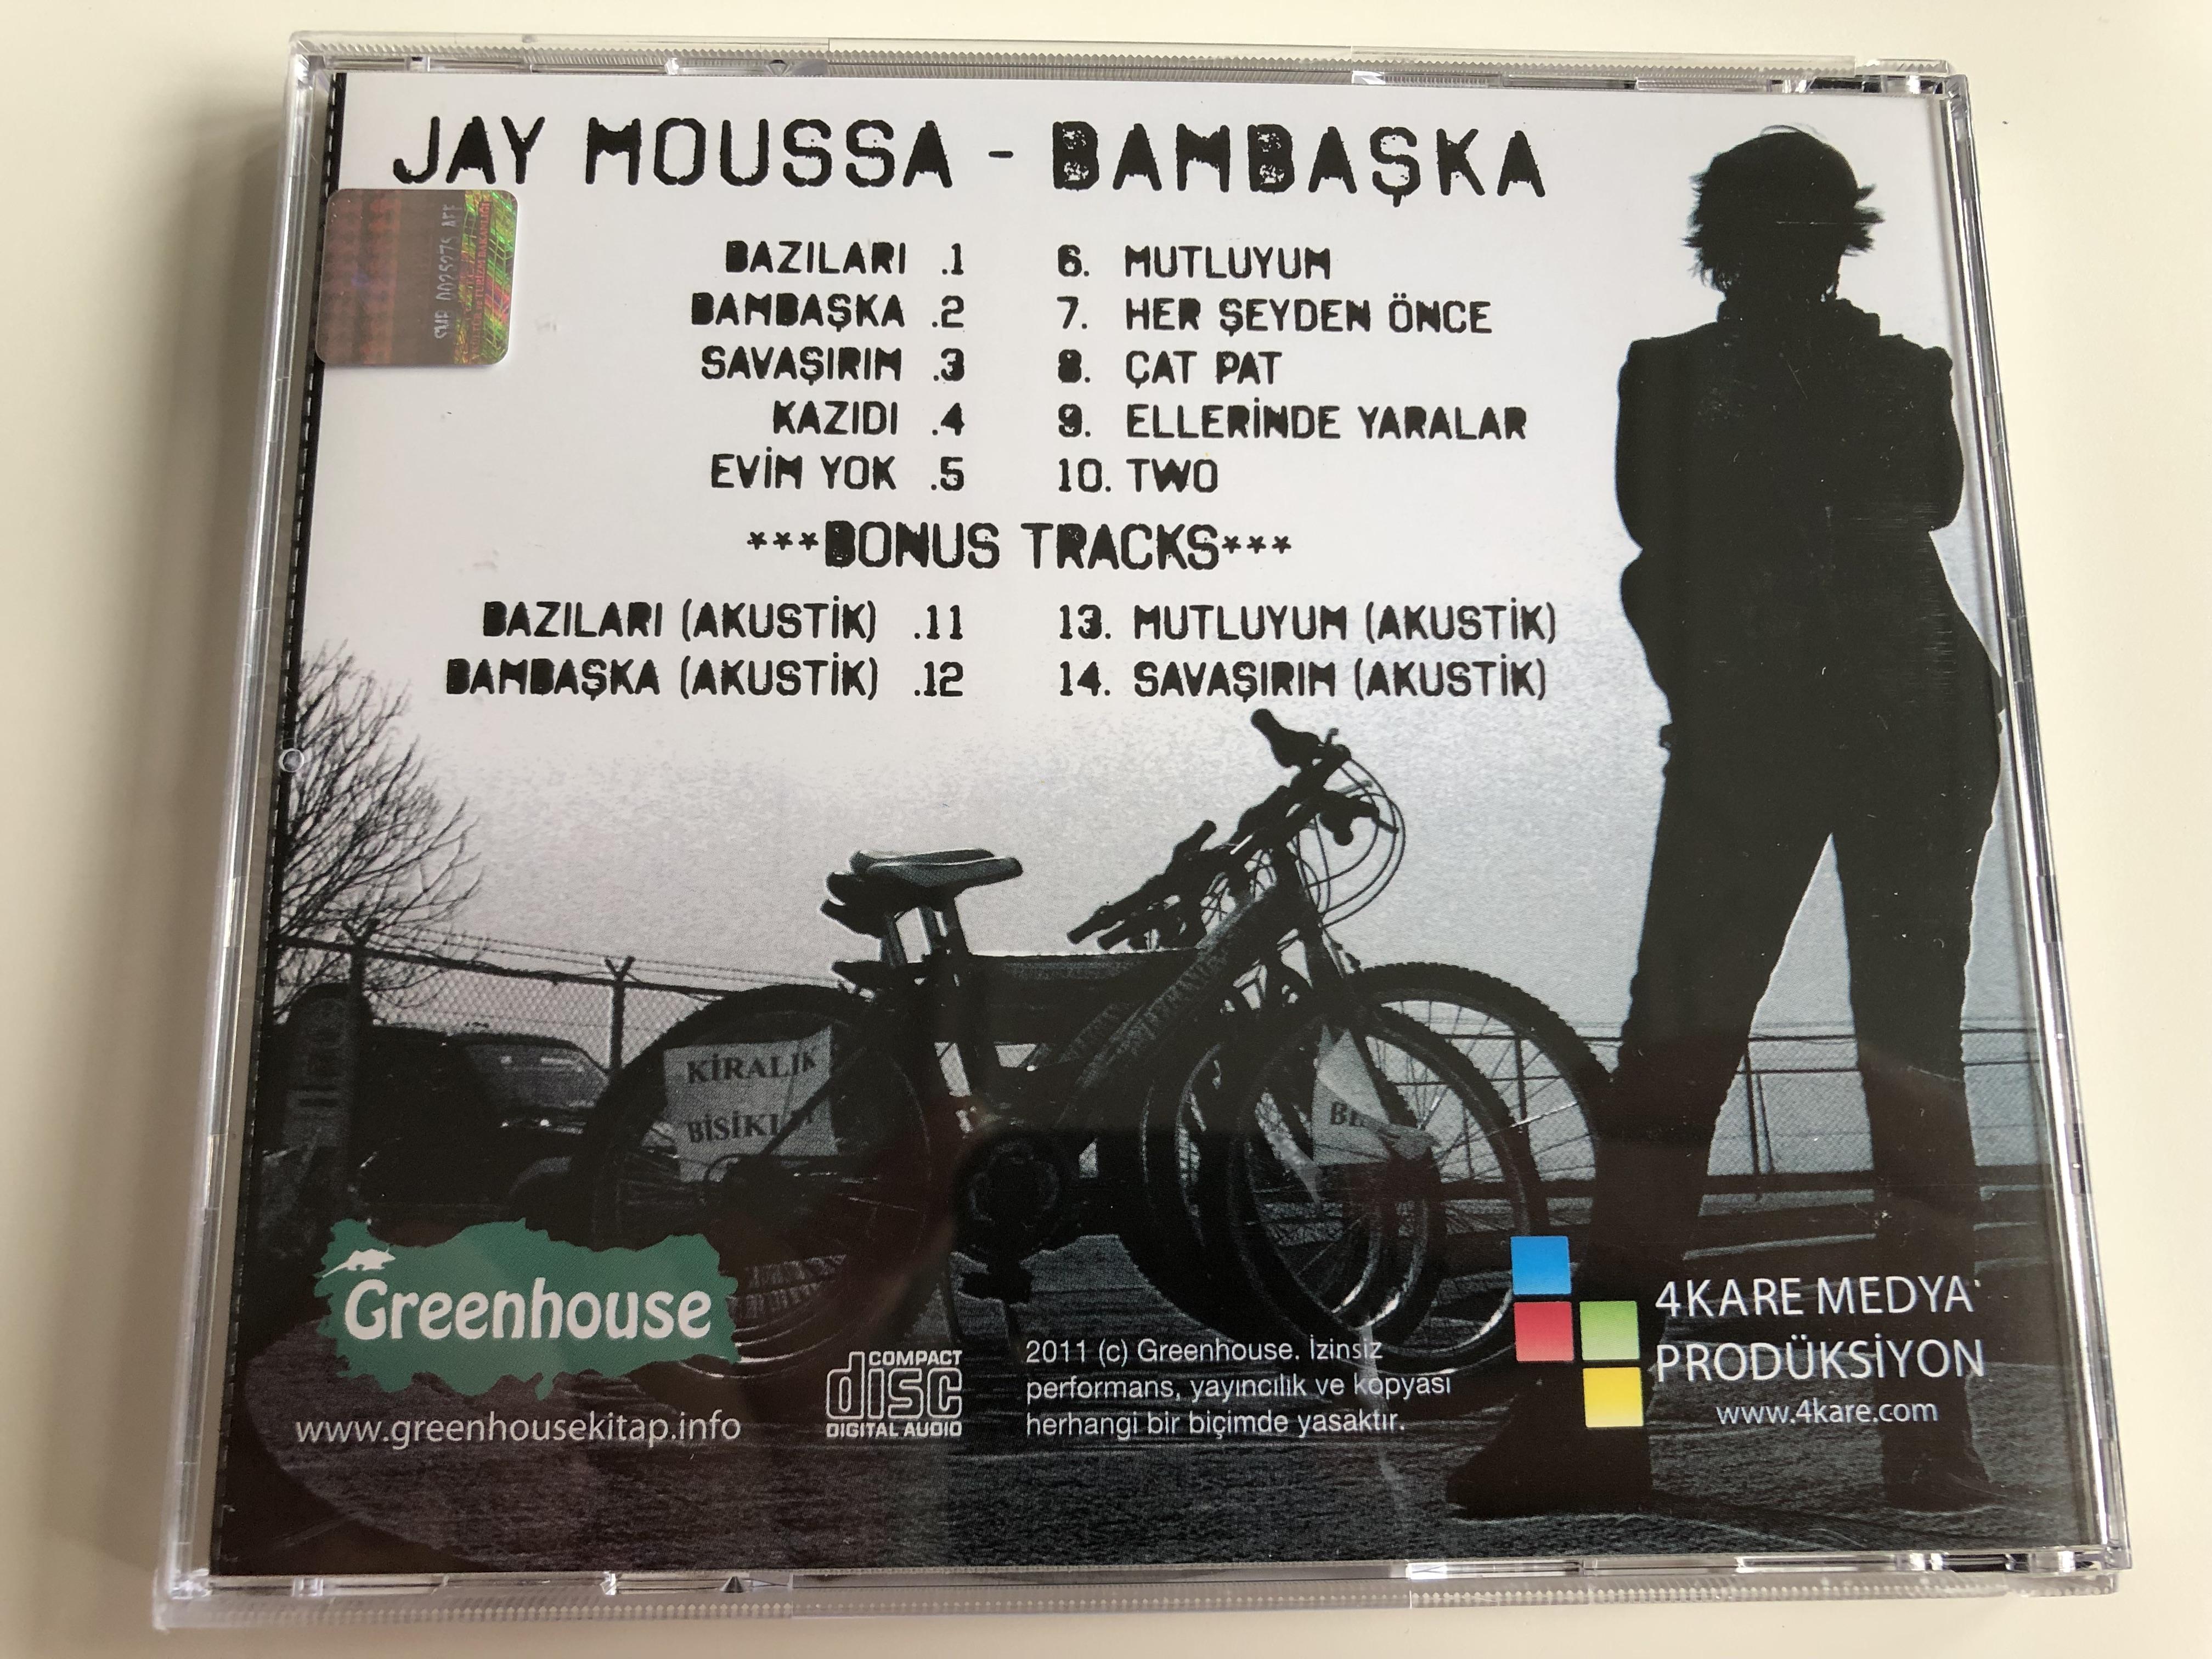 bamba-ka-jay-moussa-turkish-cd-totally-different-7-.jpg